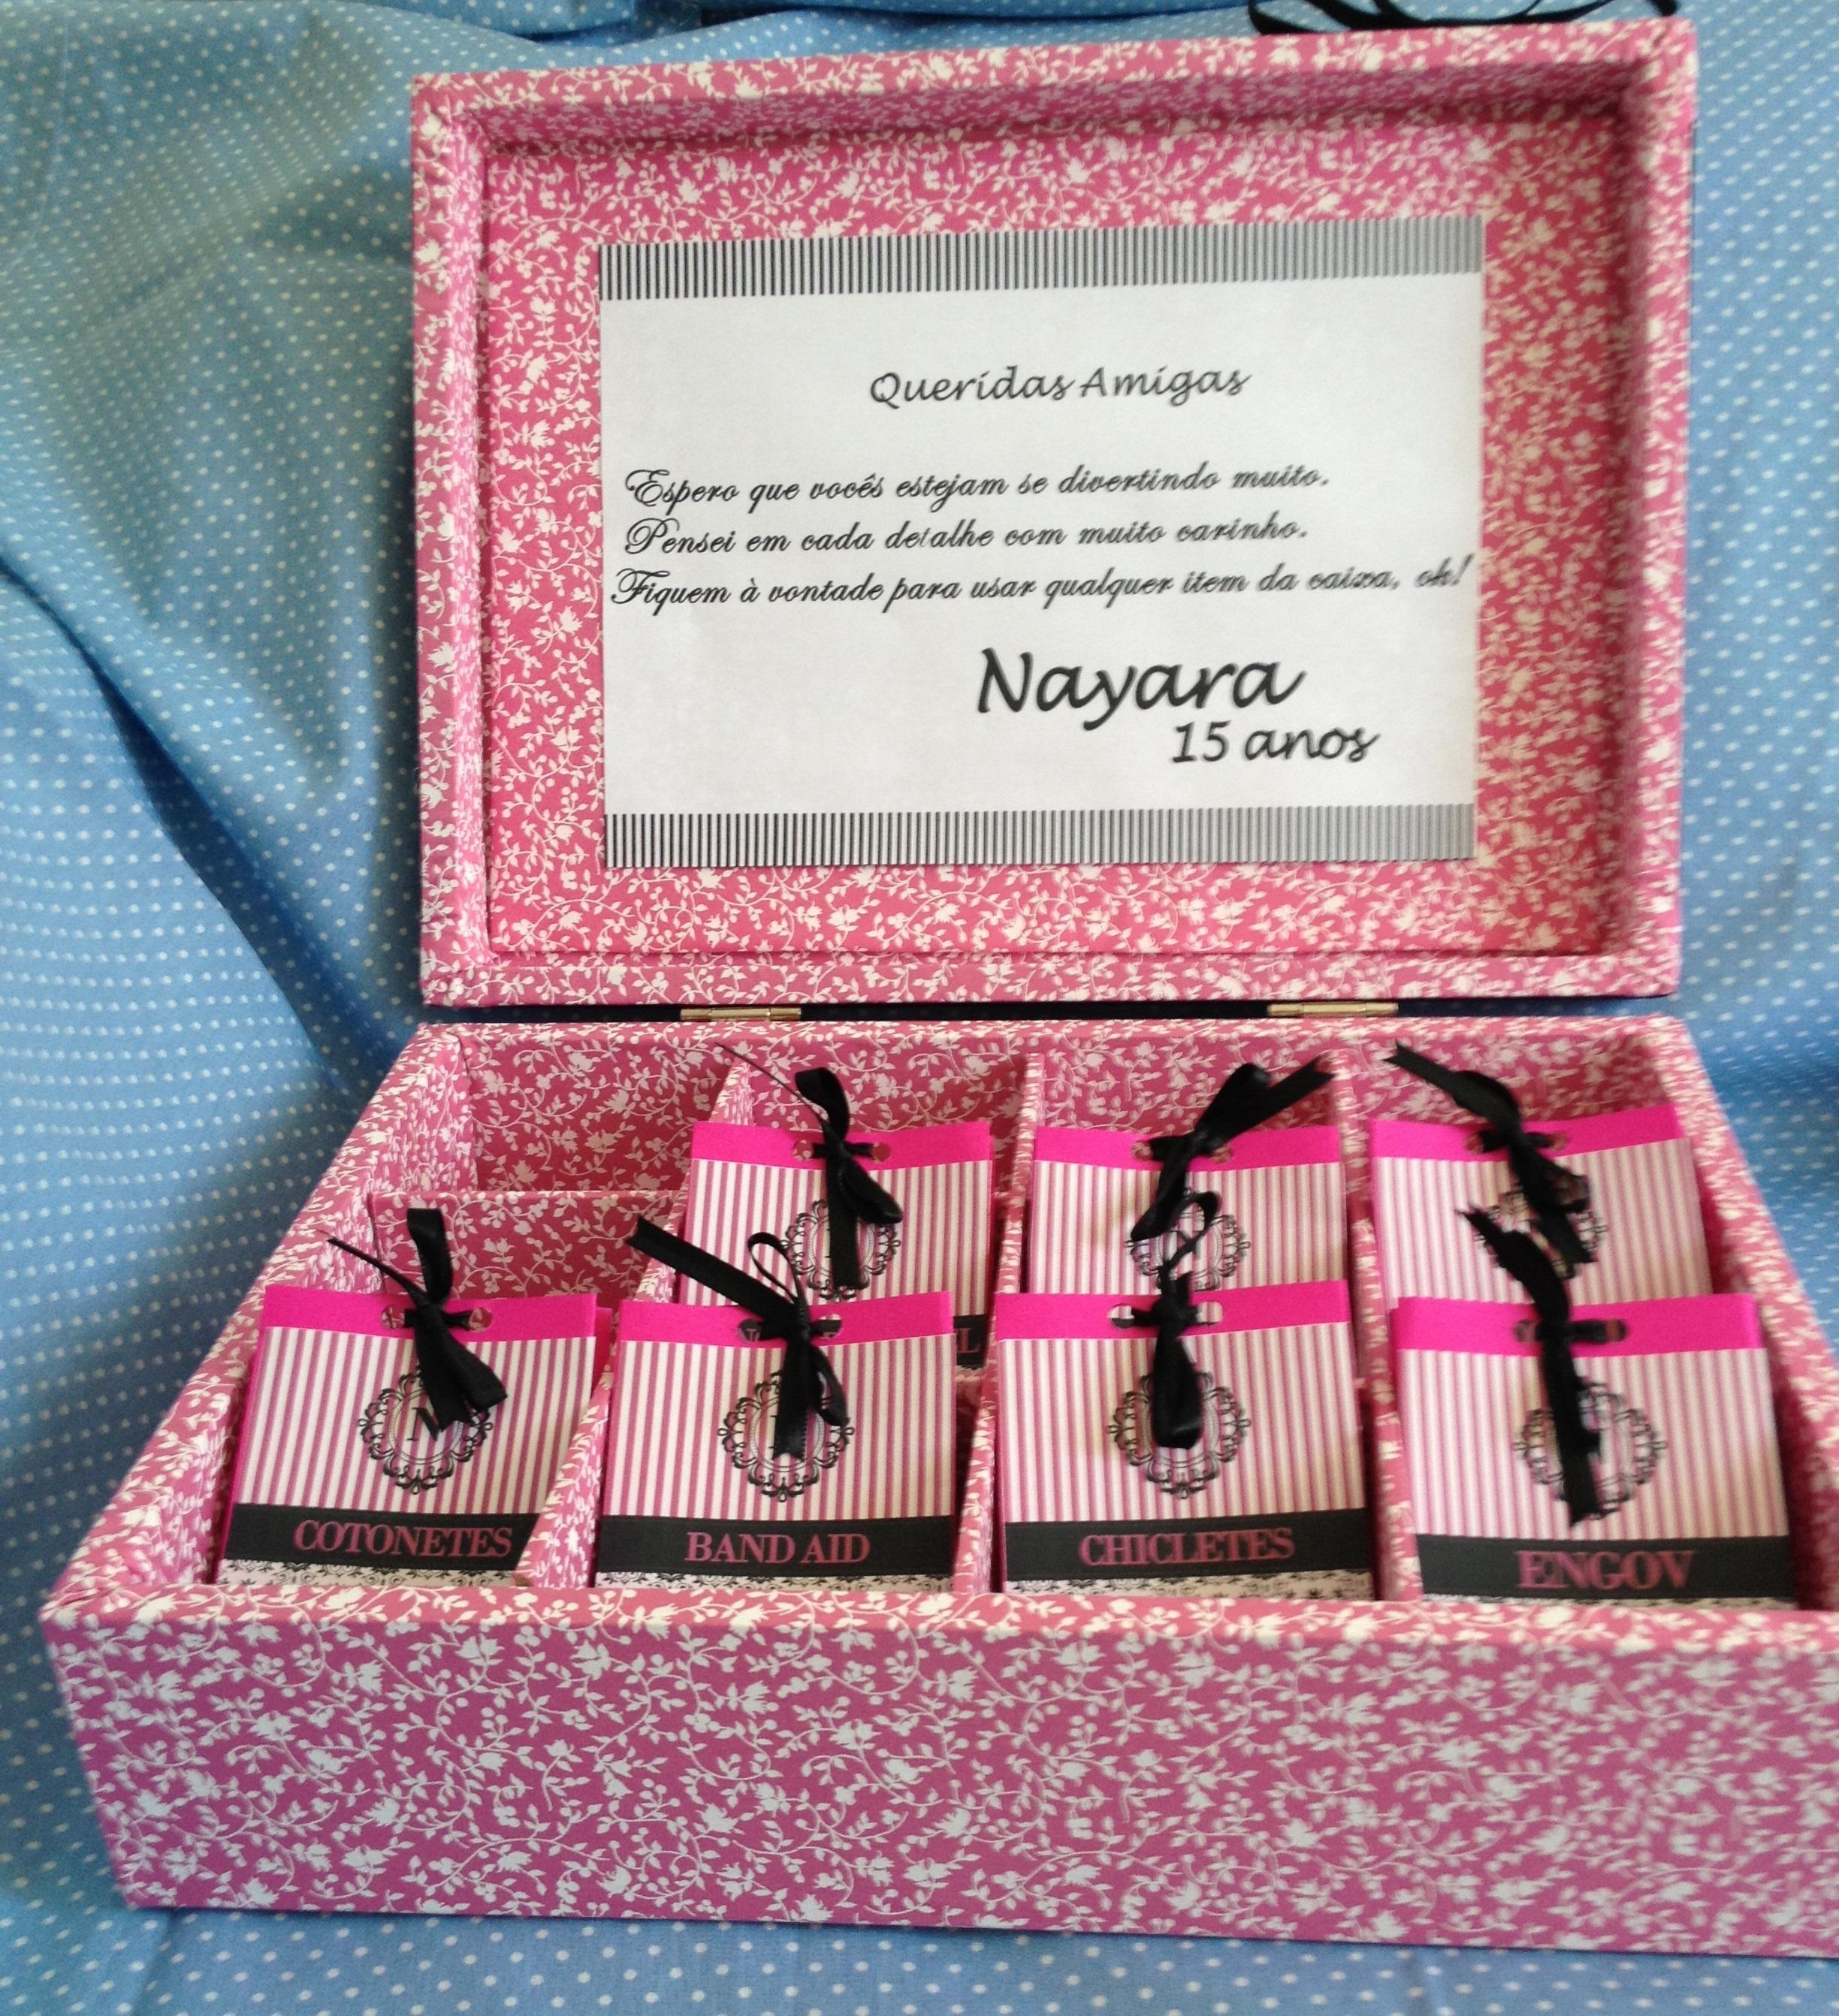 kit para banheiro casamento 15 anos kit toilet #A52658 2448 2684